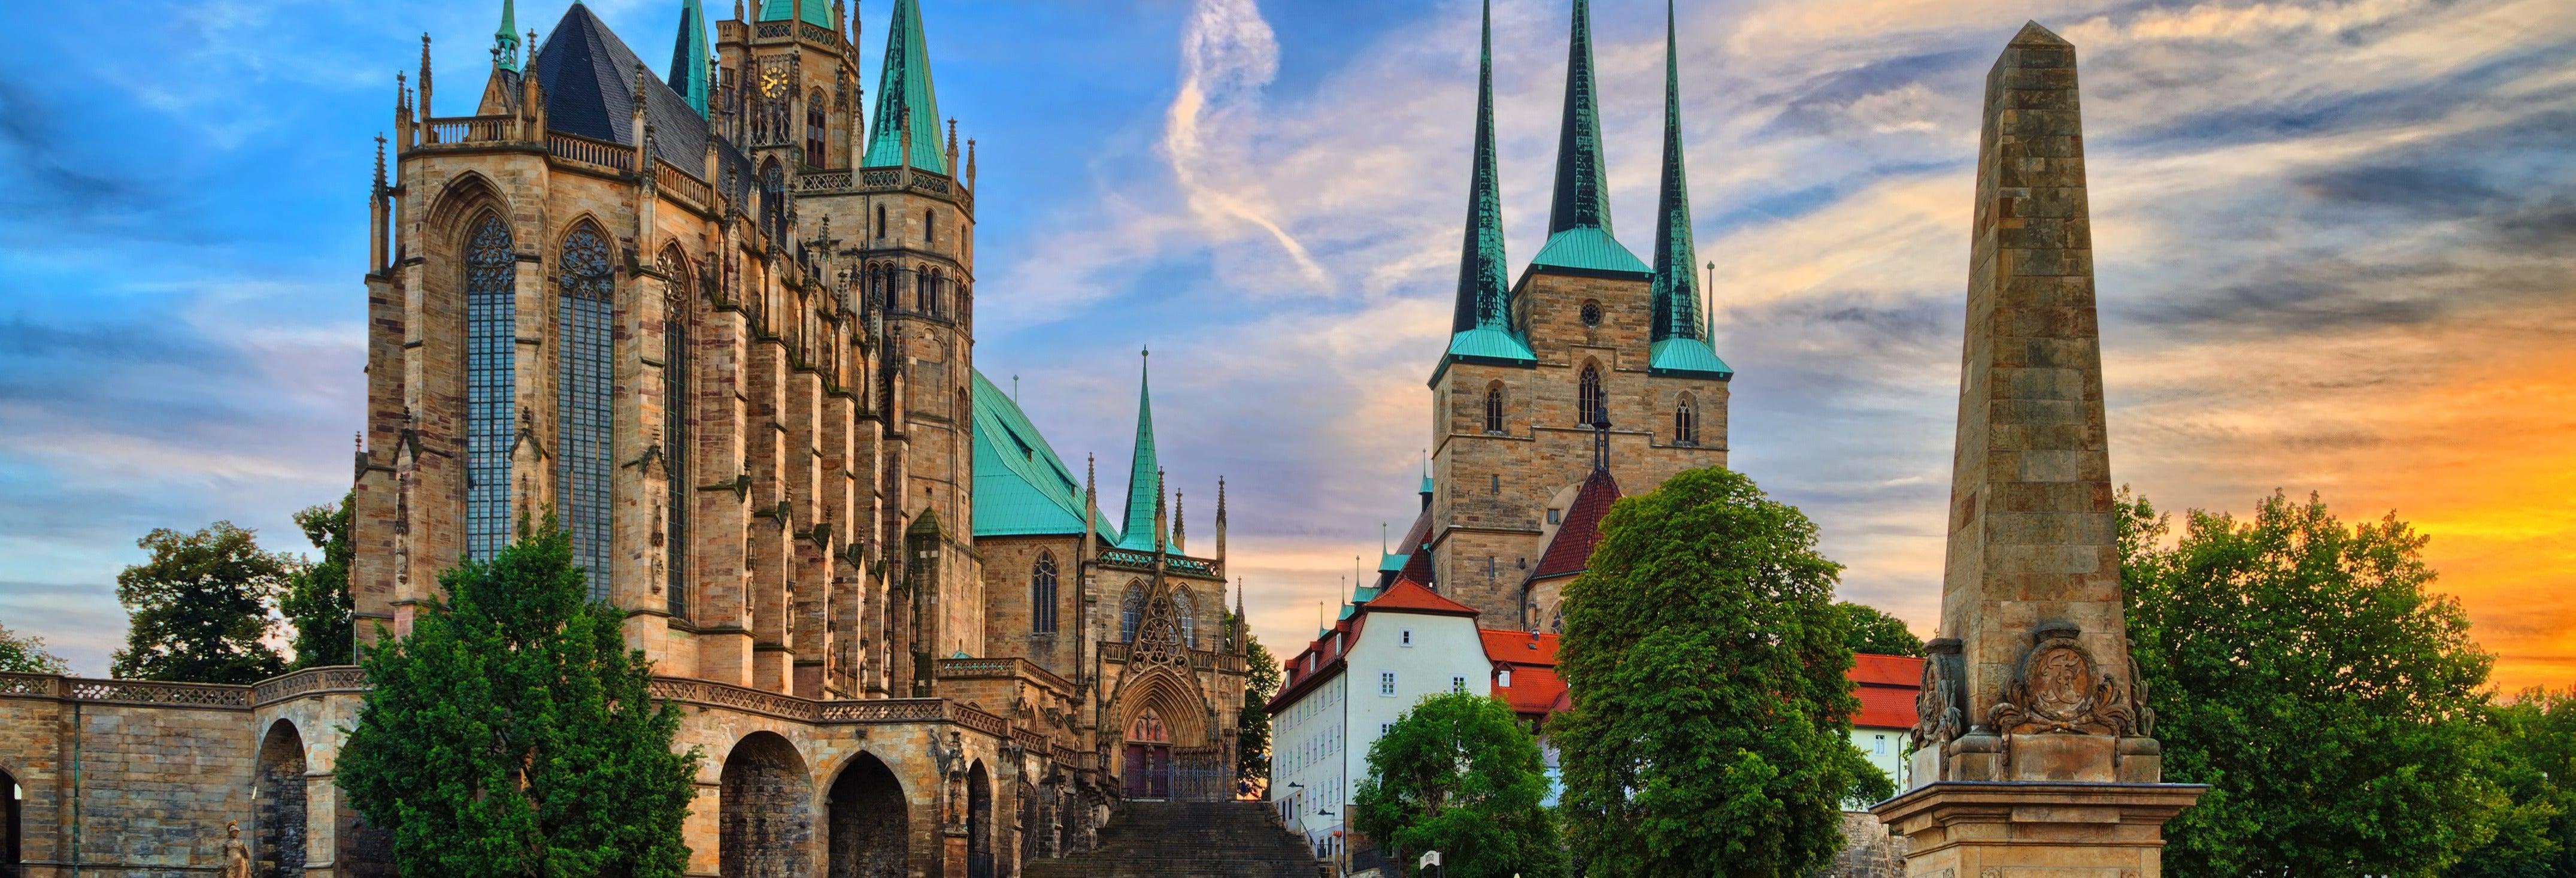 Visita guiada por Erfurt